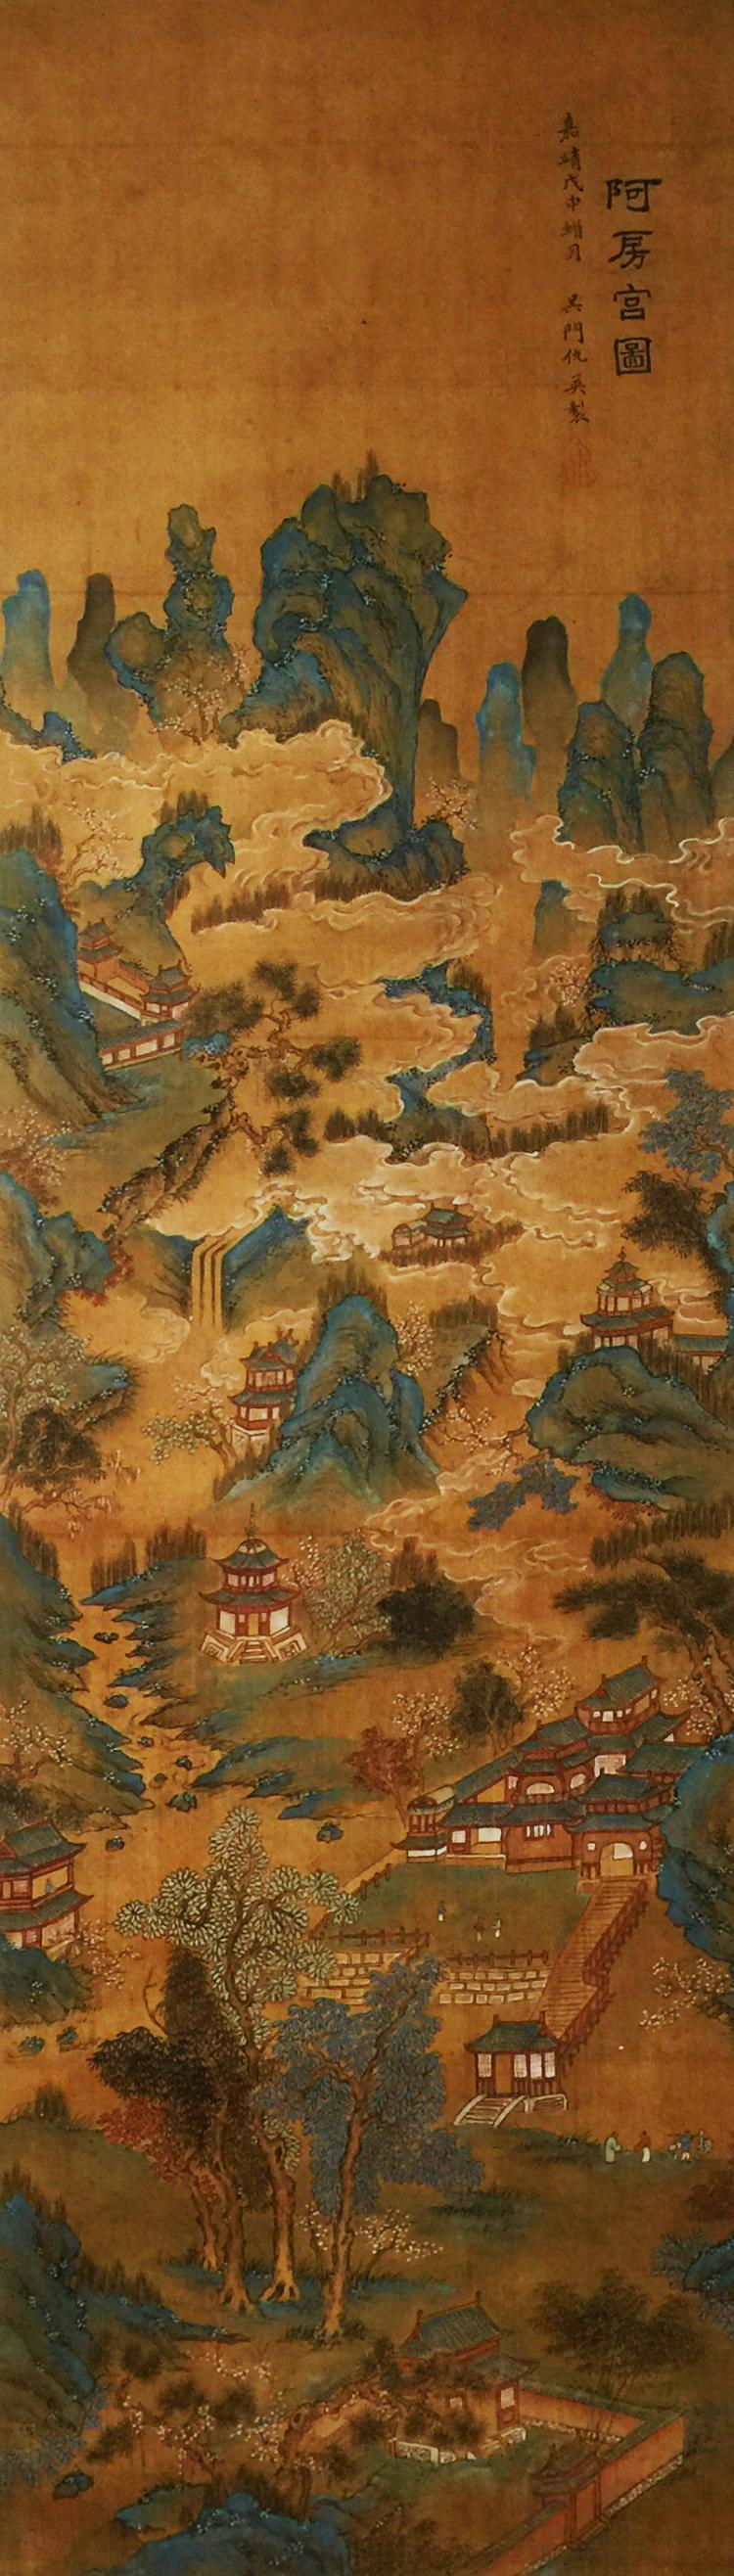 Chou Yin£¨1494-1552),Landscape